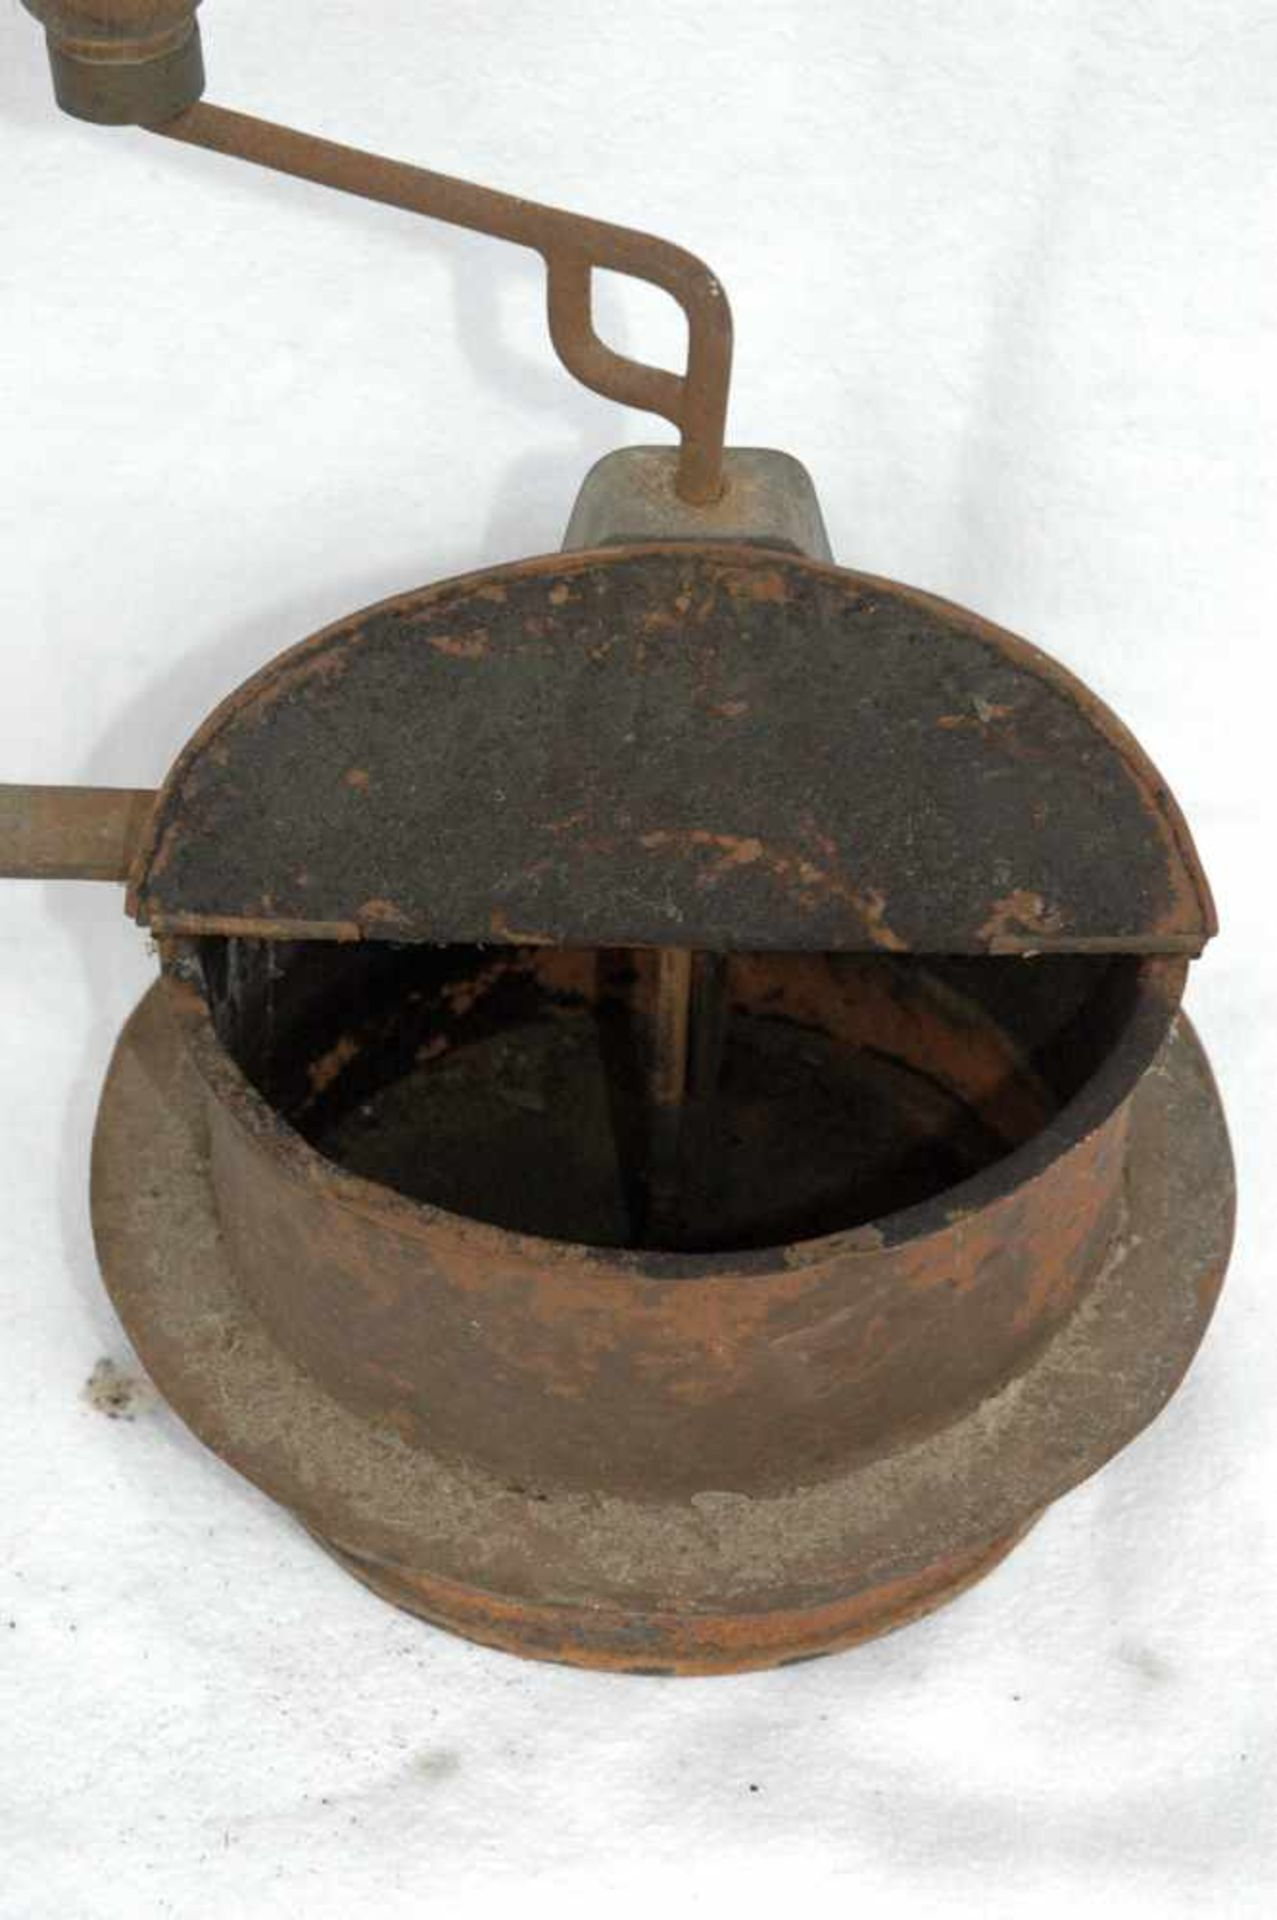 Kaffeeröster, Dm. ca. 22 cm - Bild 2 aus 3